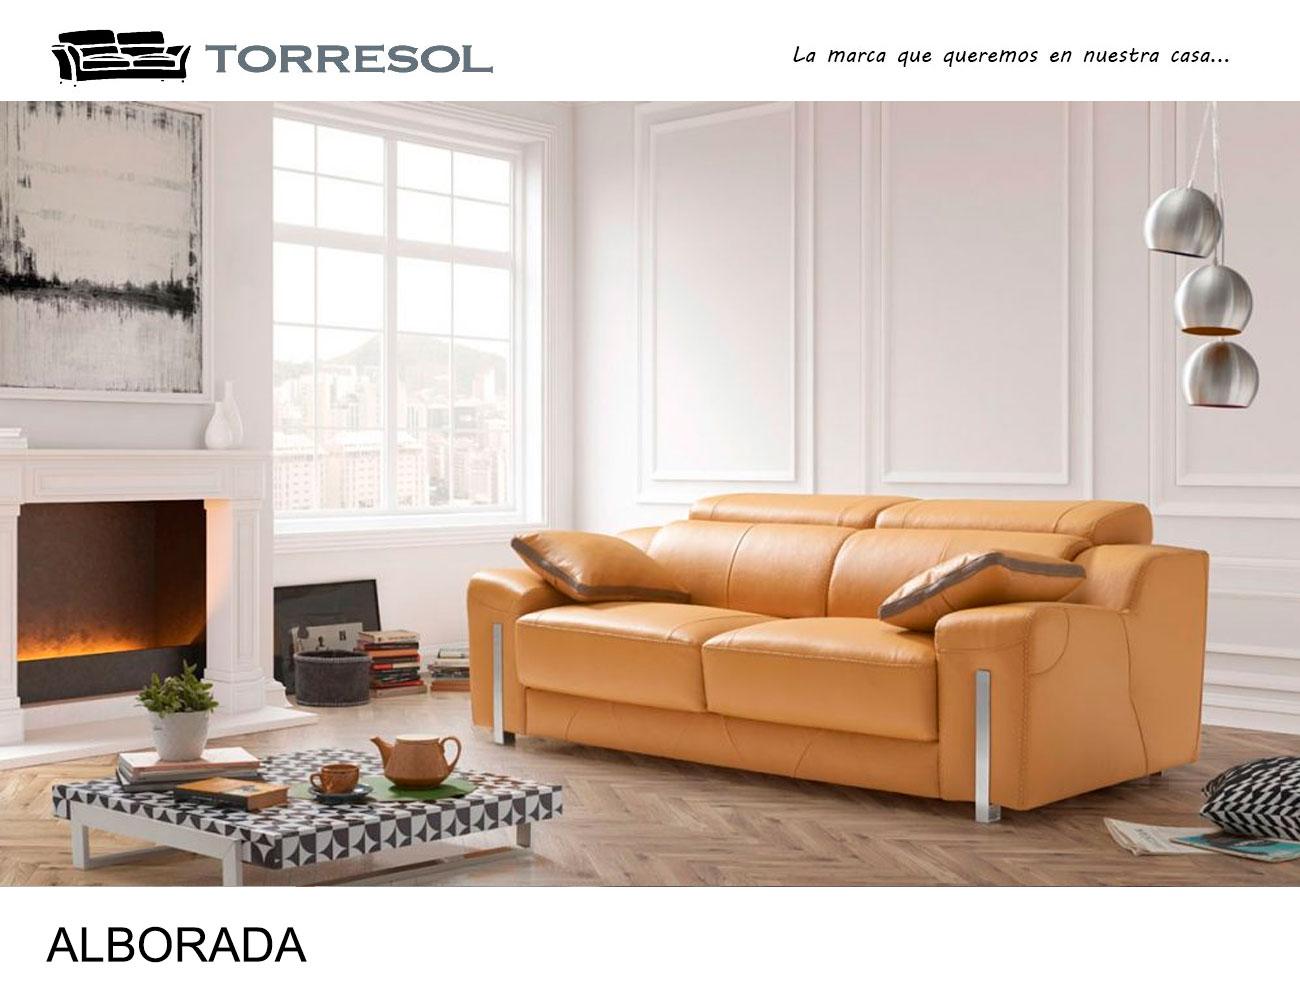 Sofa alborada torresol 2